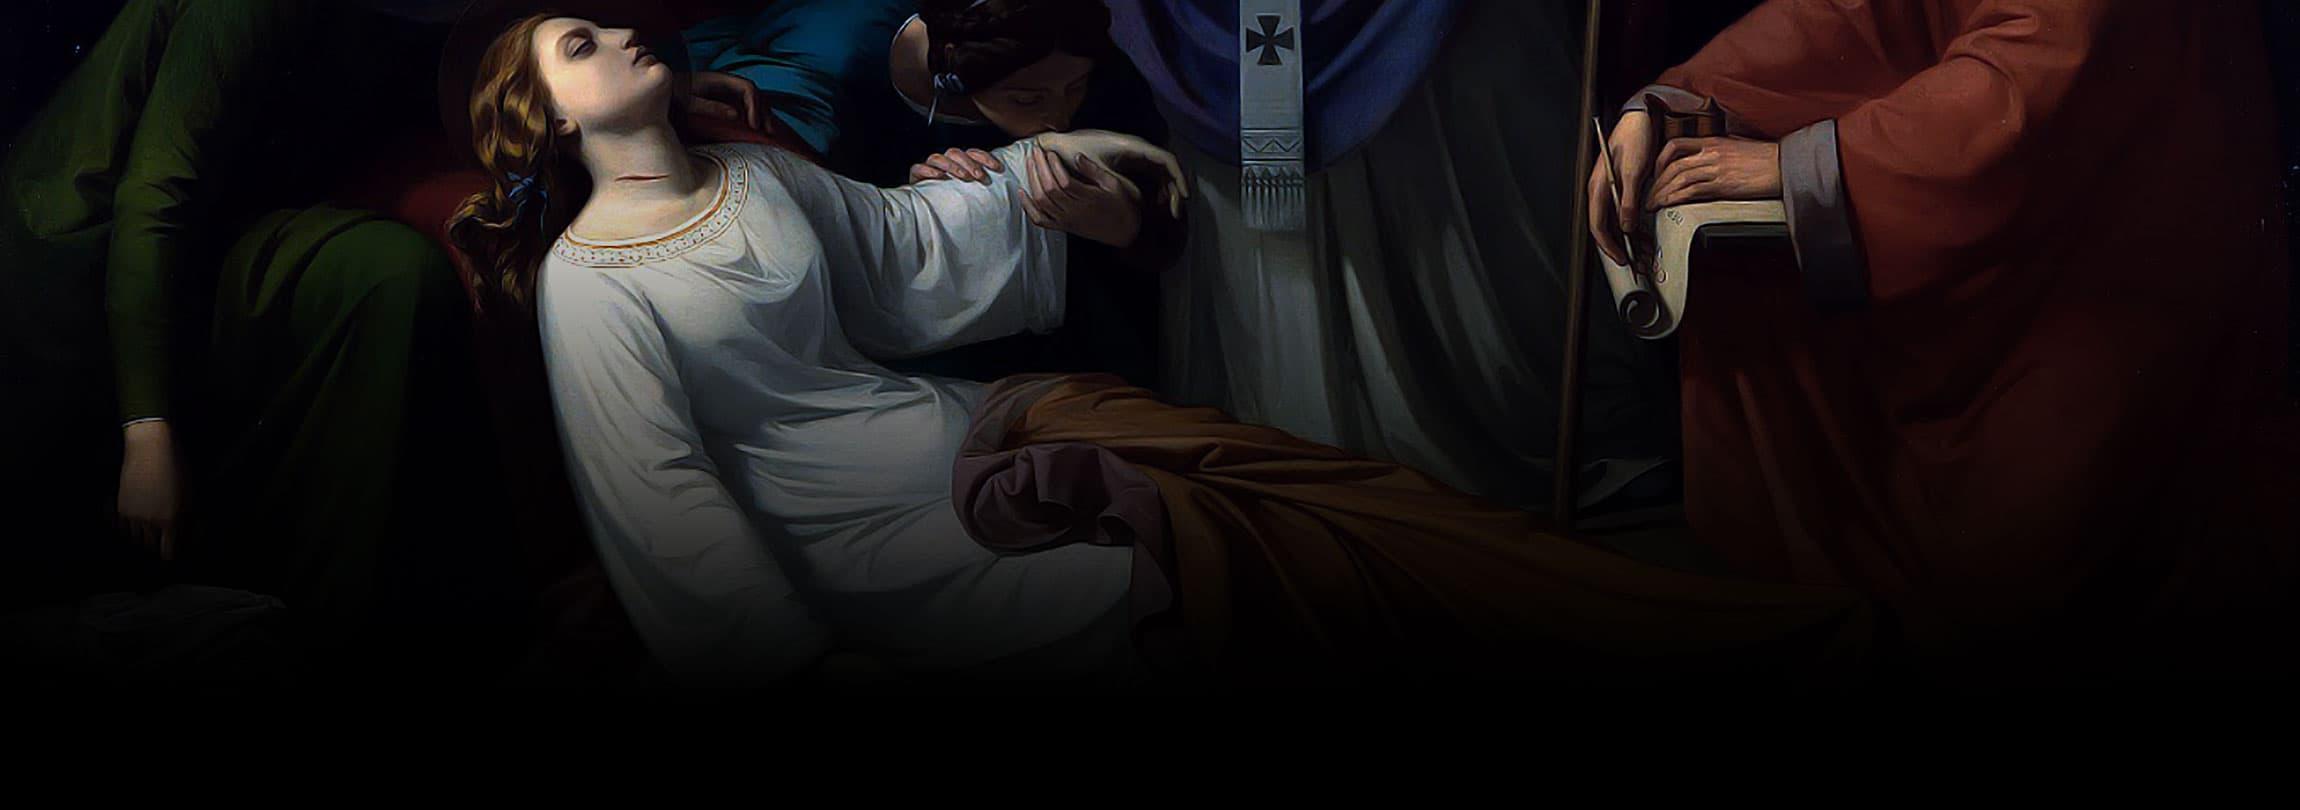 O primeiro corpo incorrupto da história da Igreja